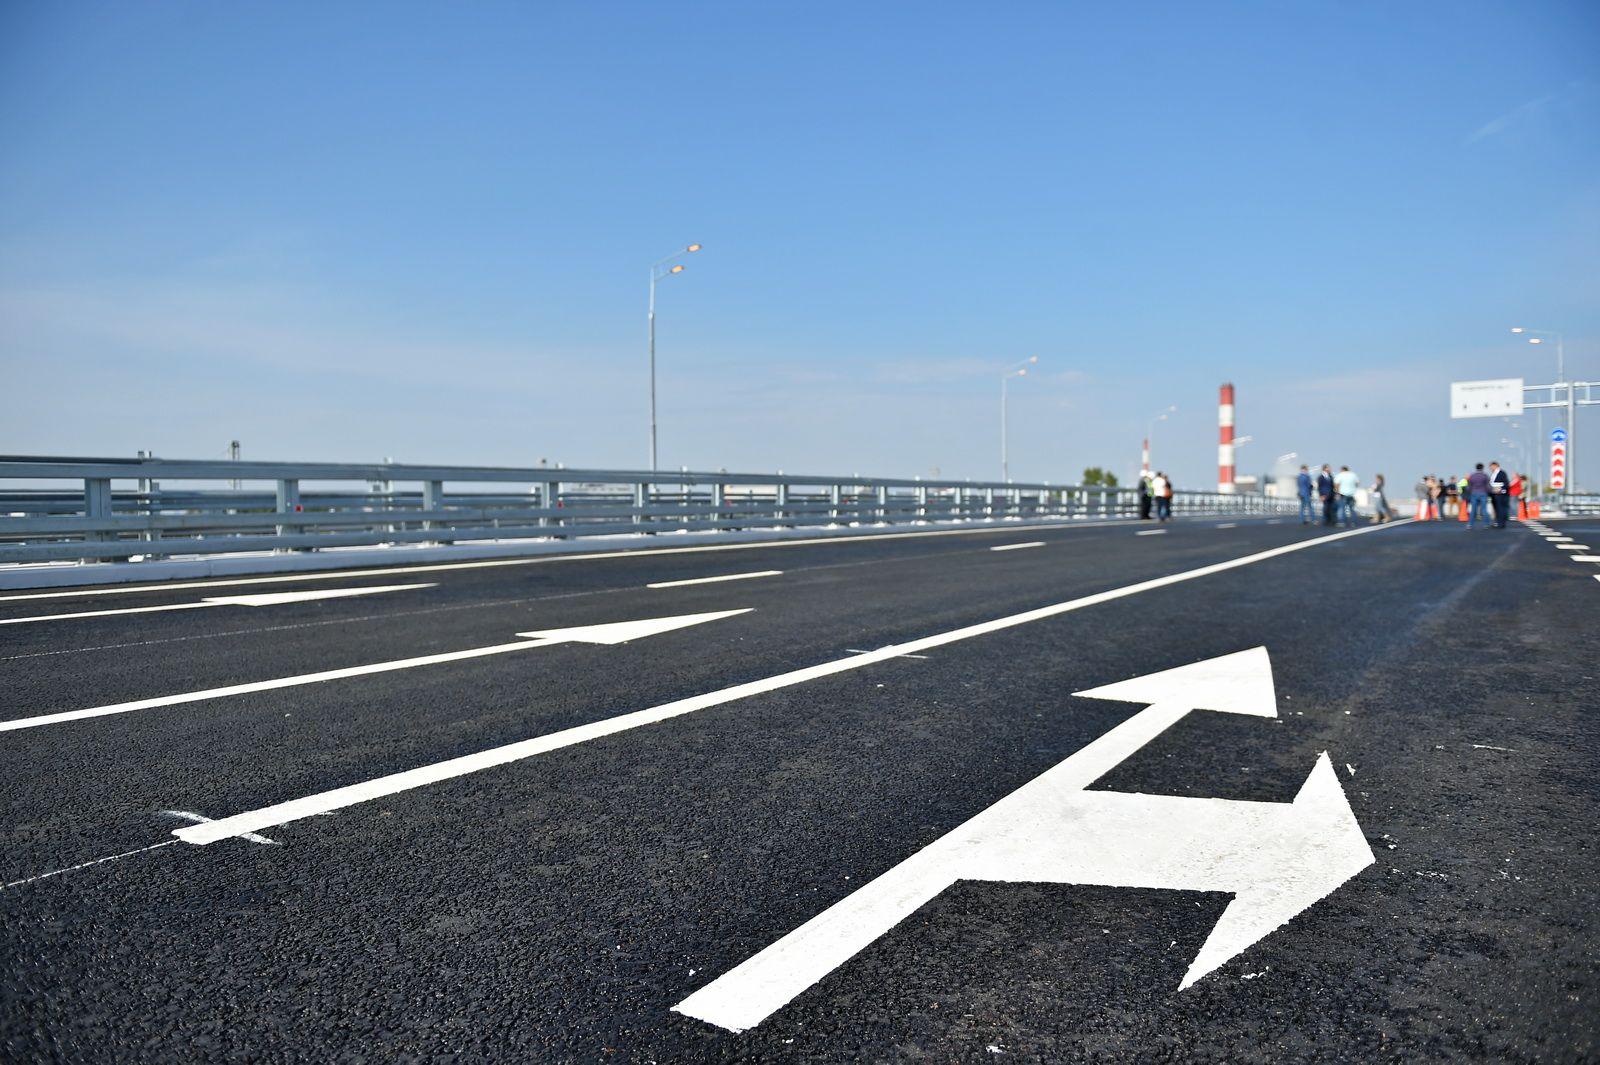 Новую развязку Ленинградского шоссе построят в Зеленограде